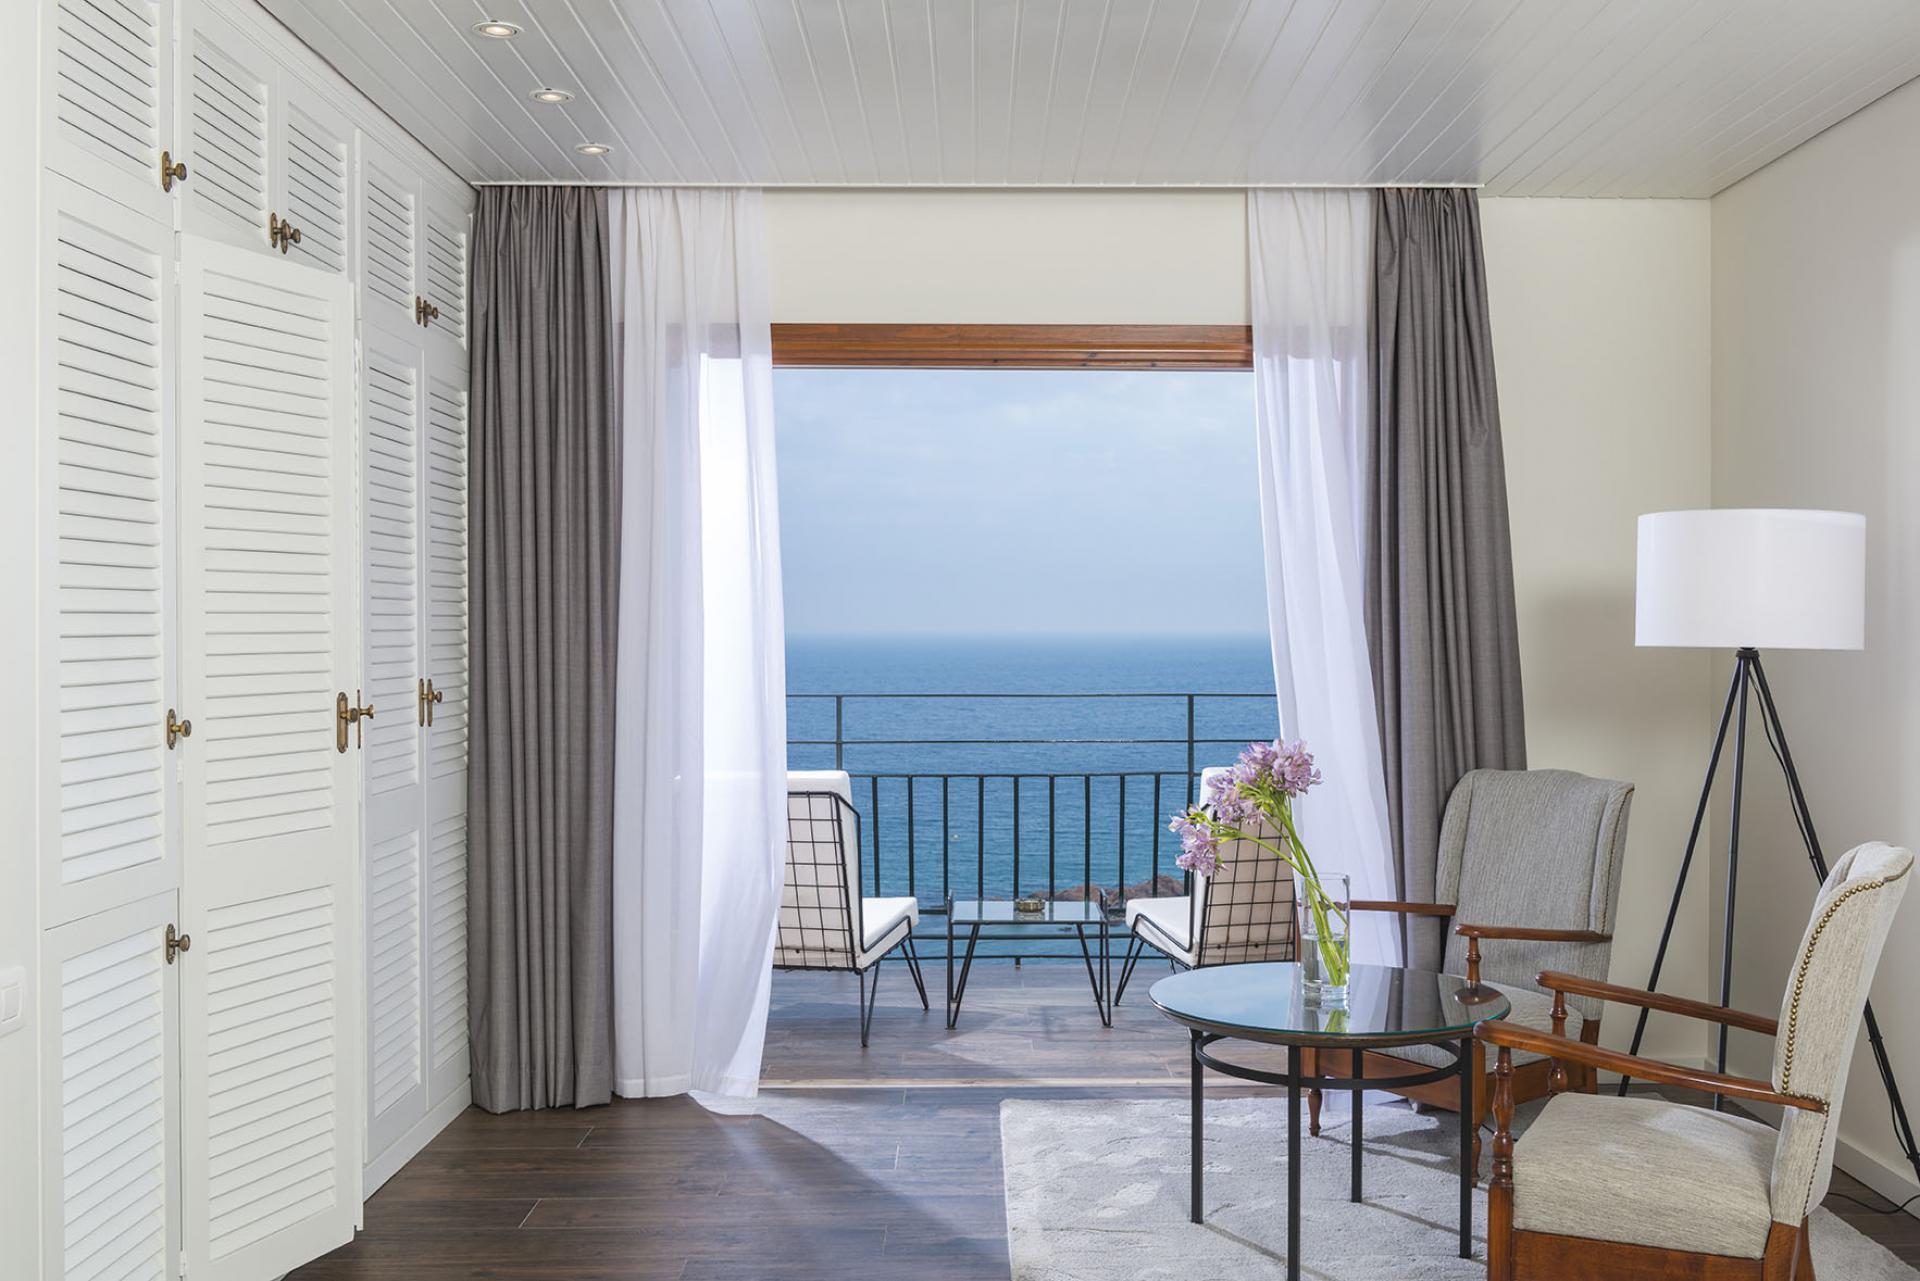 Hotel Santa Marta, LLoret de Mar, Costa Brava, Spain